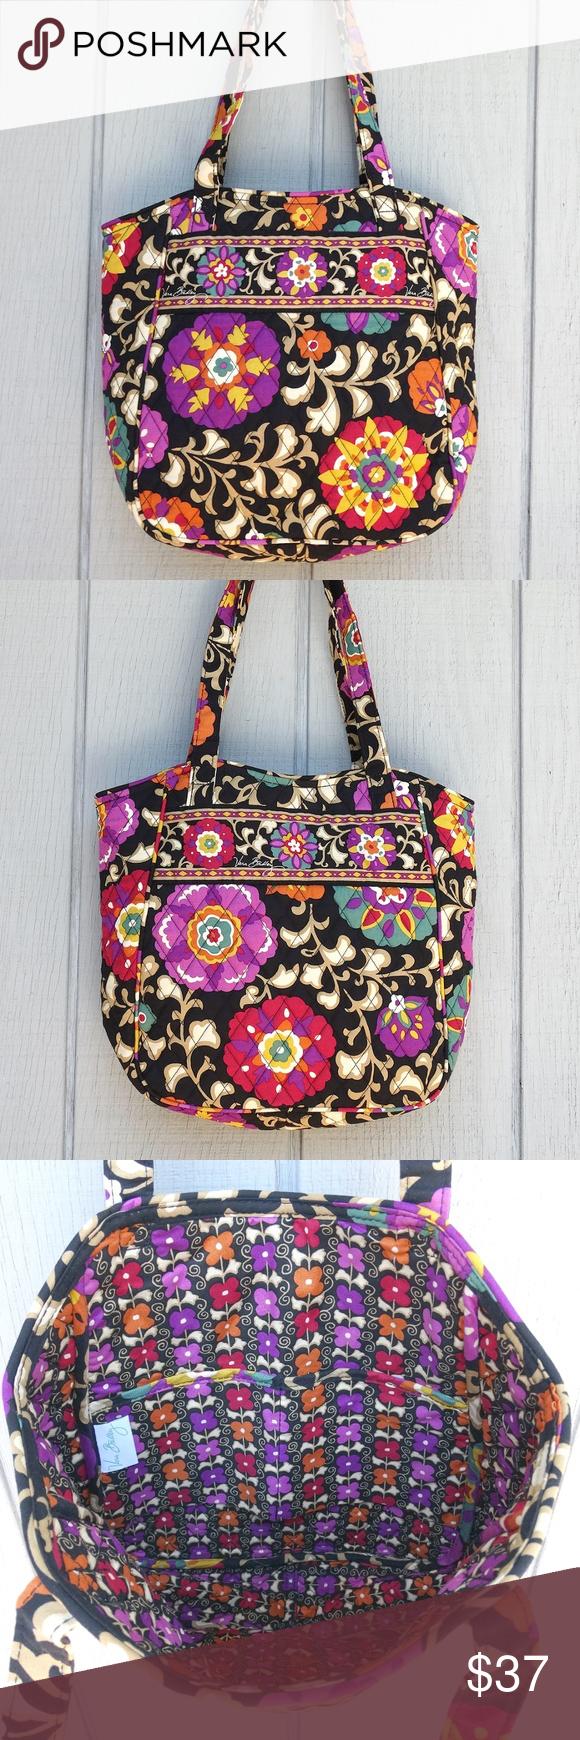 Vera Bradley Black Floral Quilted Tote Bag Like NU : quilted bags like vera bradley - Adamdwight.com